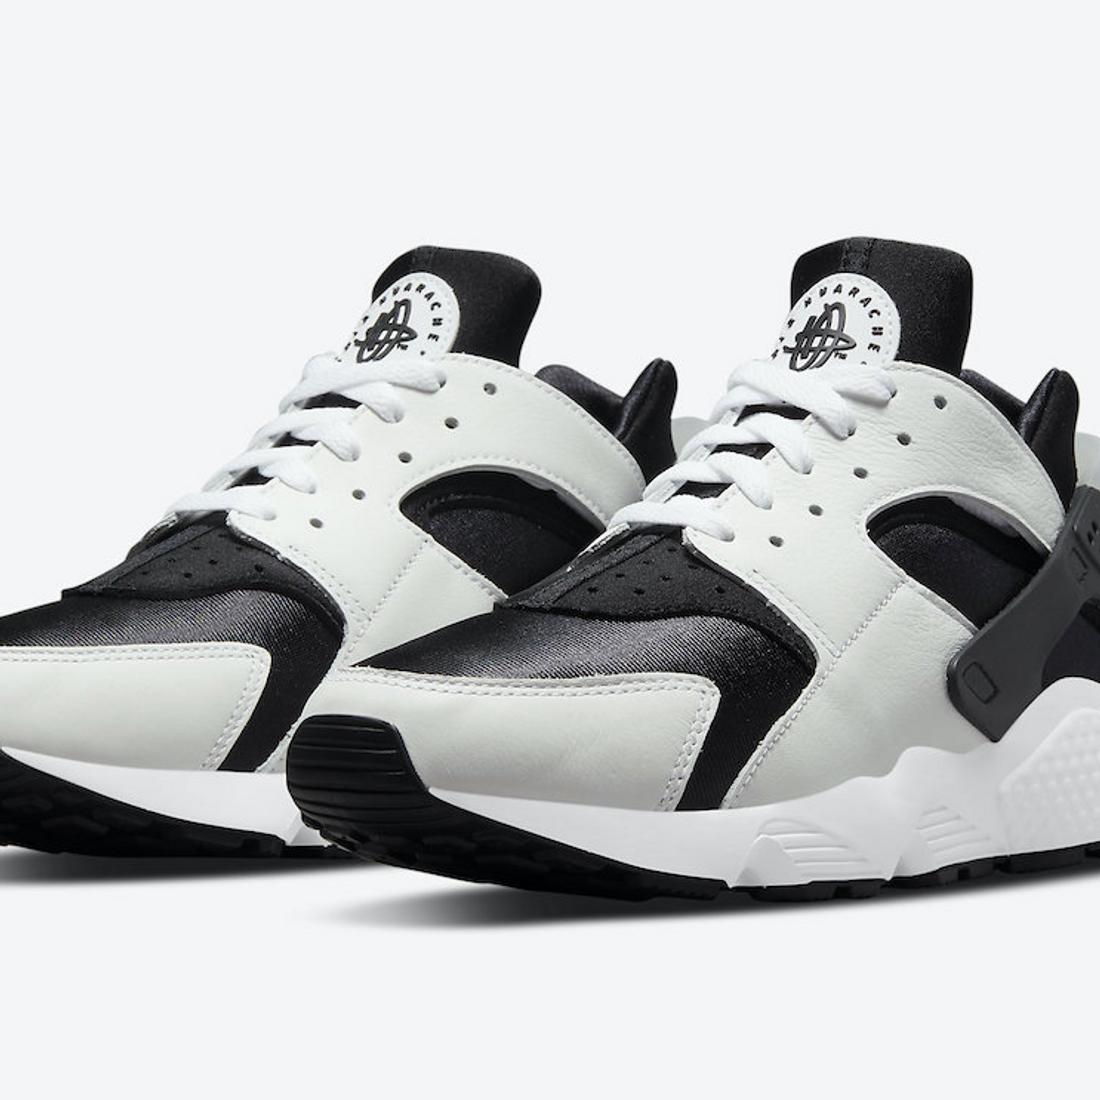 The First-Ever Retro of an OG Nike Air Huarache - Sneaker Freaker